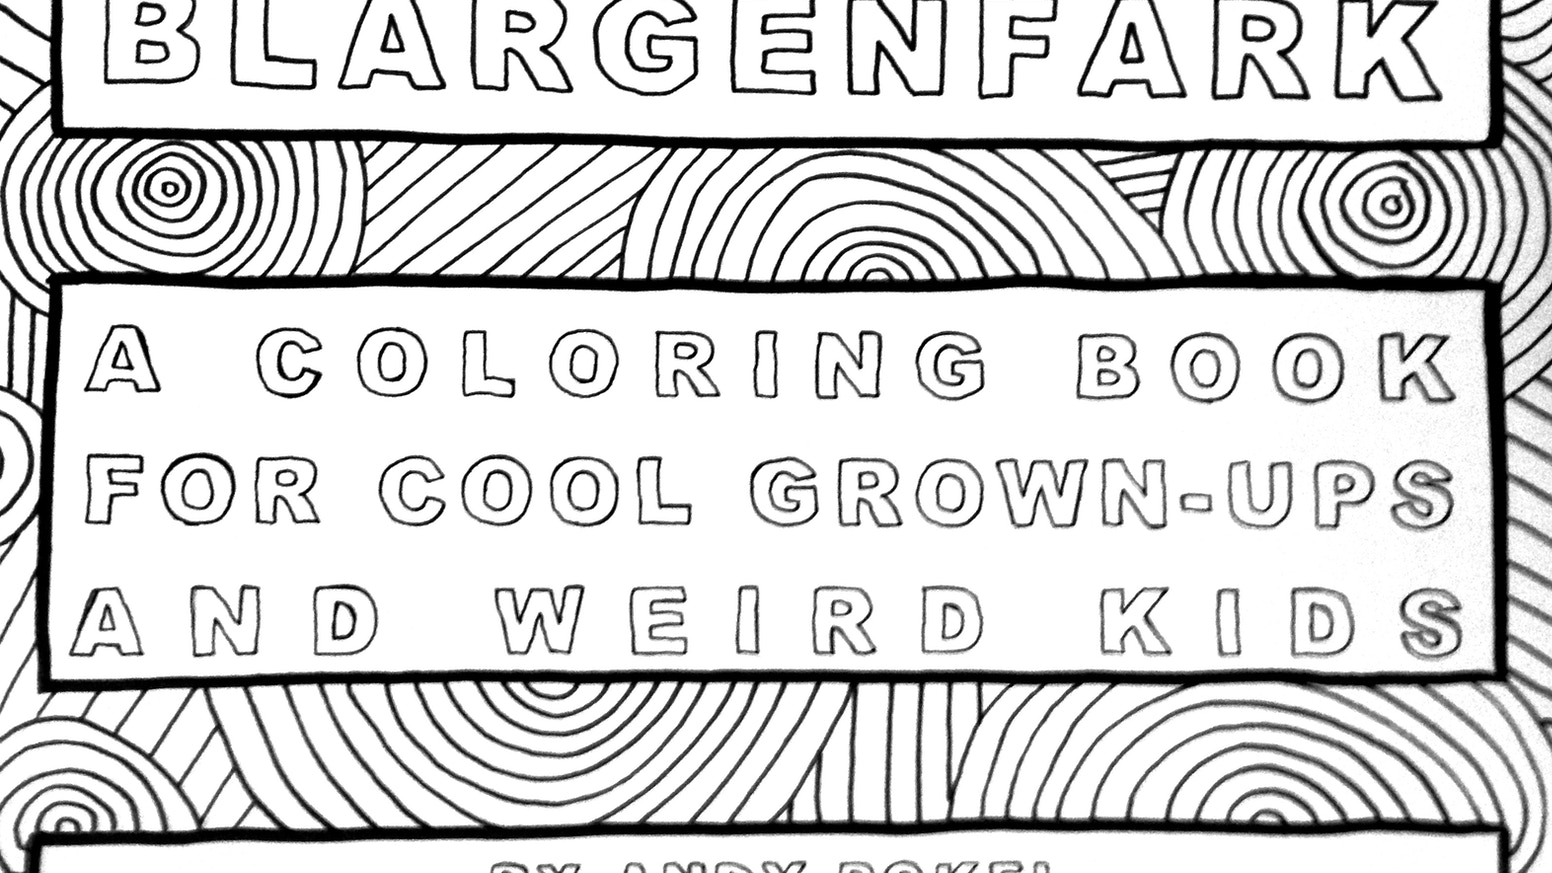 BLARGENFARK A Coloring Book For Cool Grown Ups Weird Kids